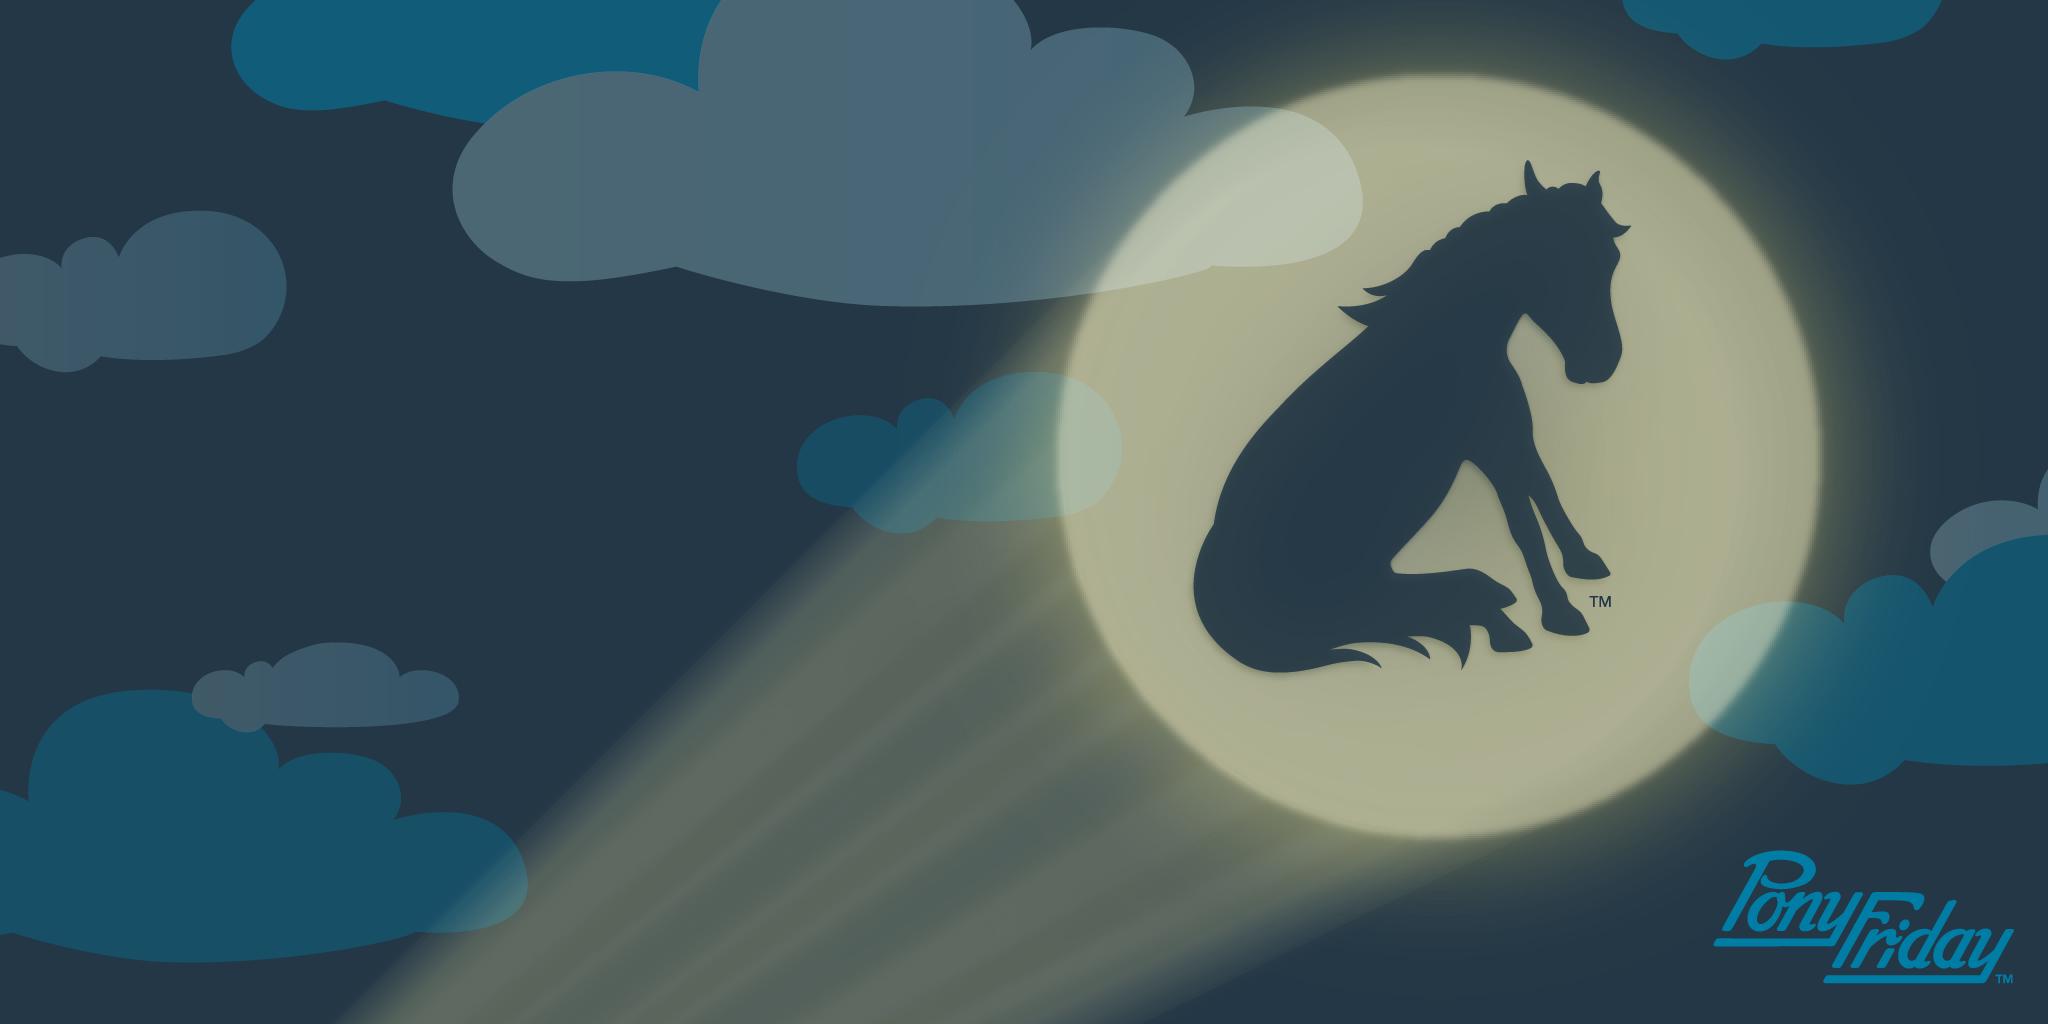 Pony-Friday-Batman-Parody-Sky-Light-Horse-Night-Blog-Header.png